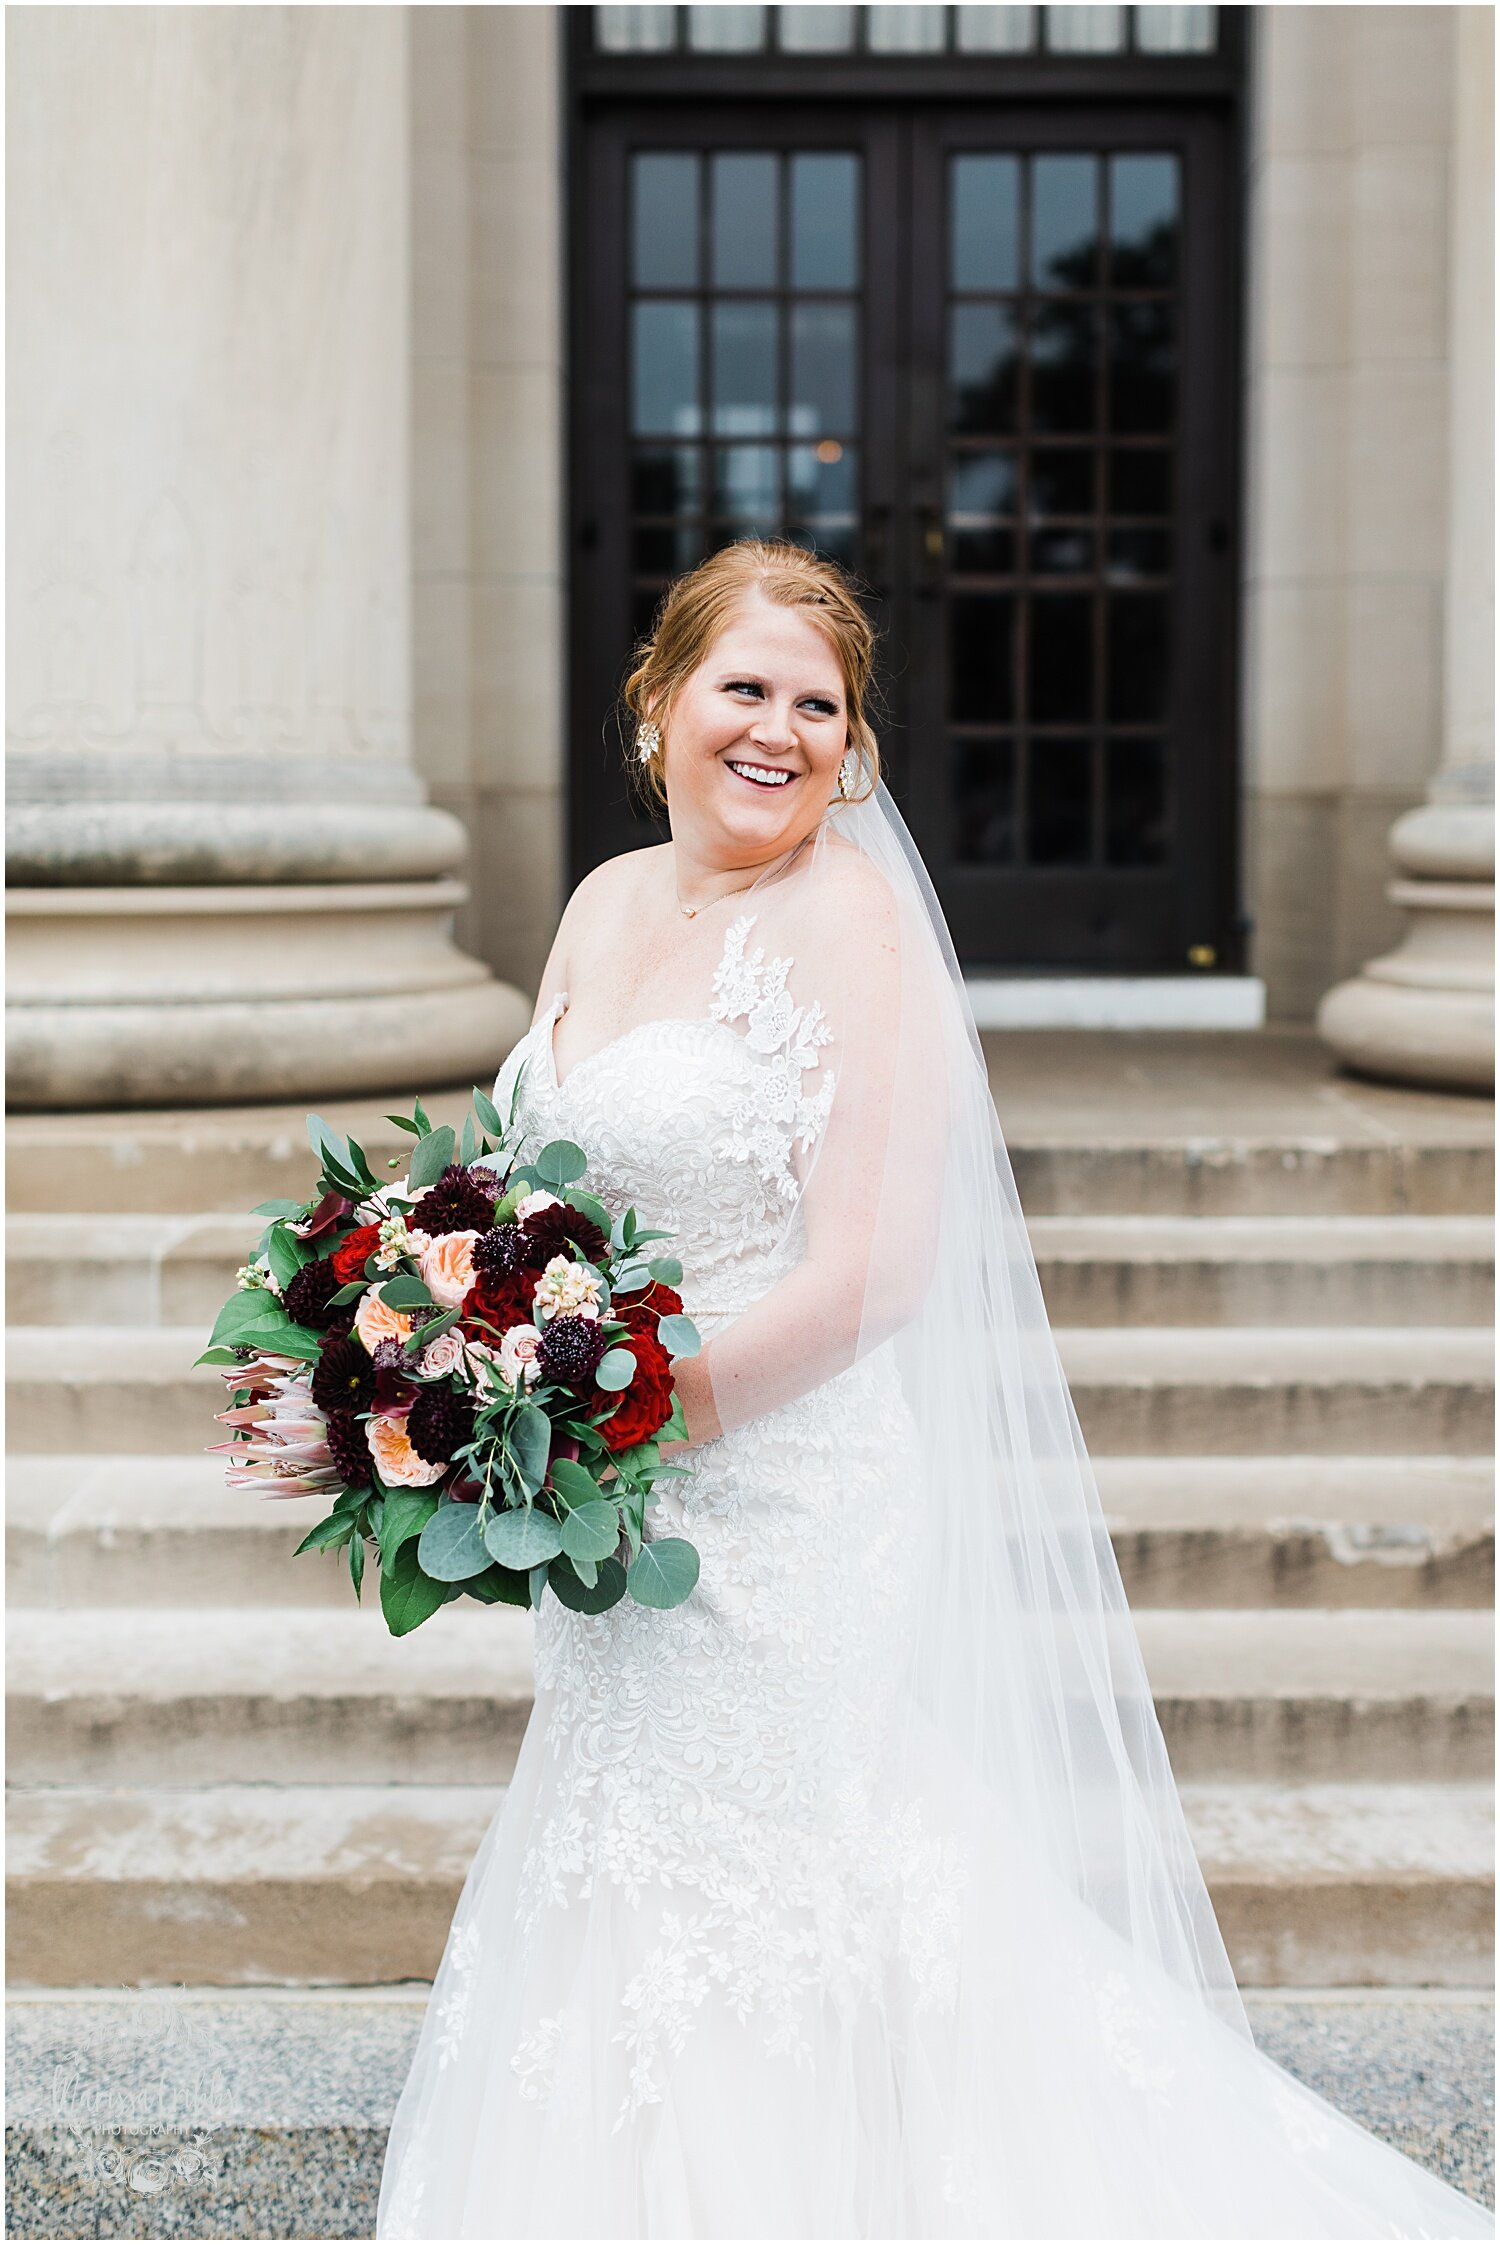 ANNA & LUKE MARRIED BLOG | MARISSA CRIBBS PHOTOGRAPHY | WESTON RED BARN FARM_9385.jpg